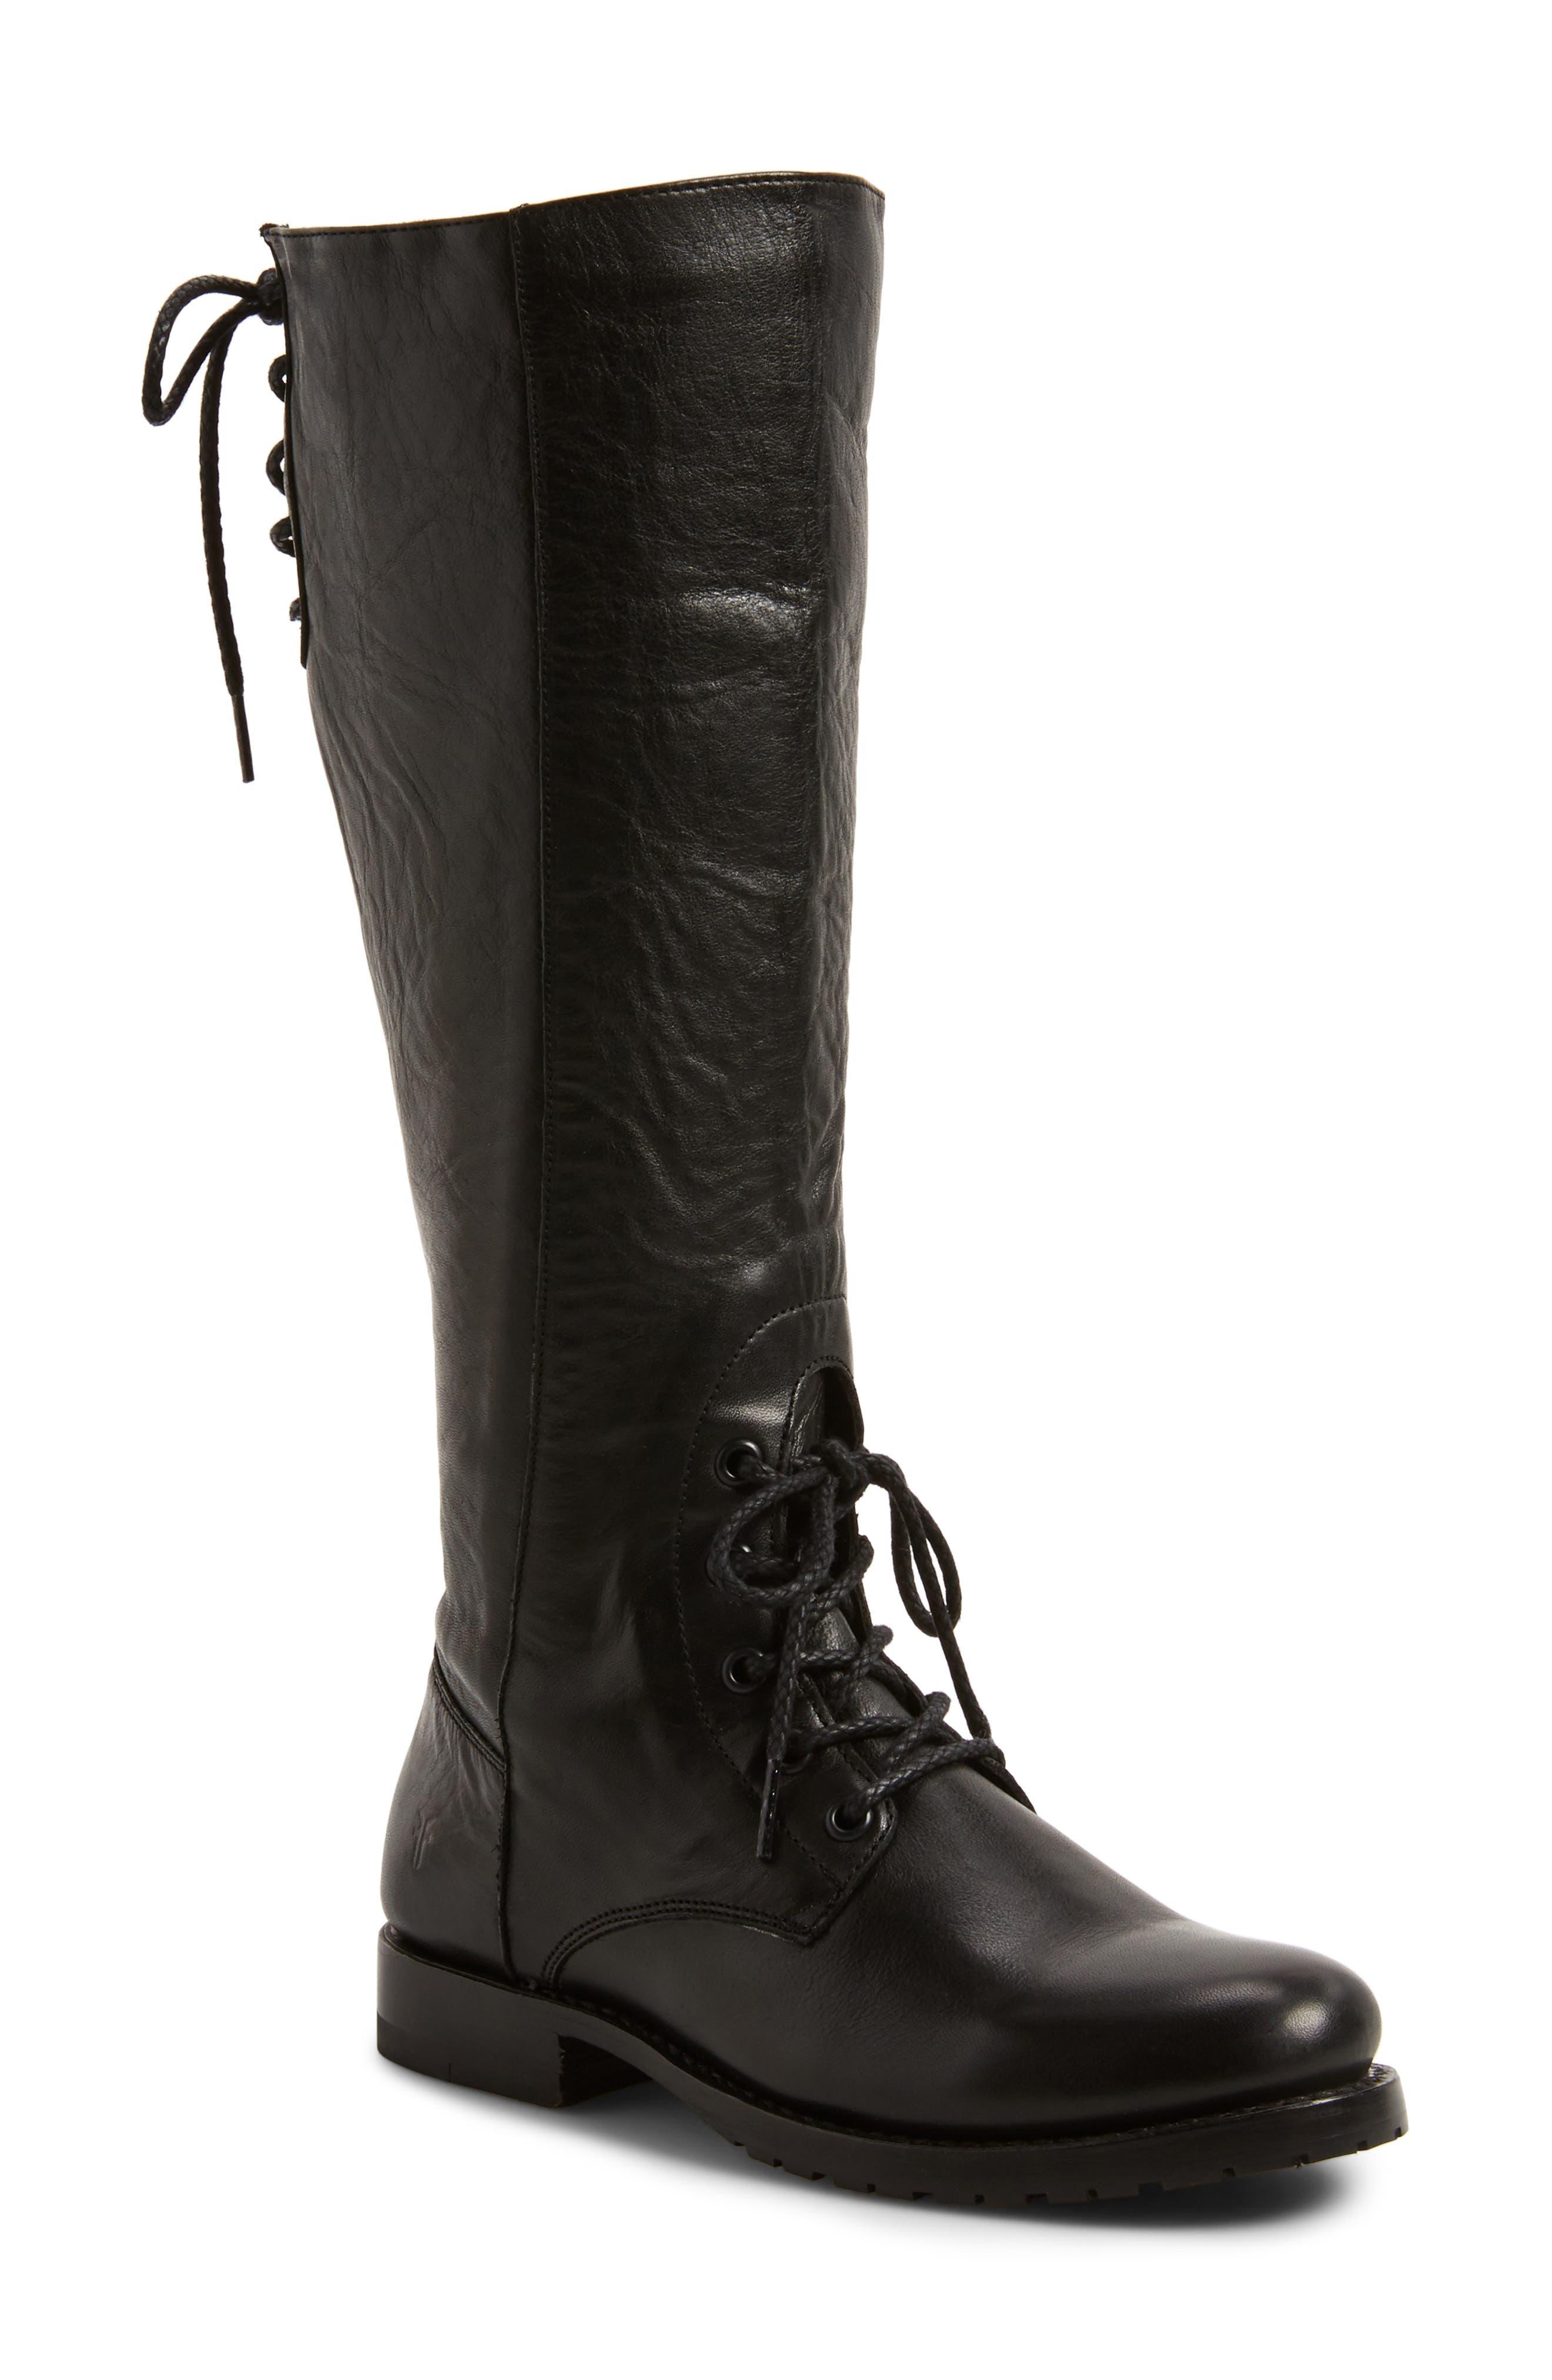 Alternate Image 1 Selected - Frye Natalie Knee High Combat Boot (Women)